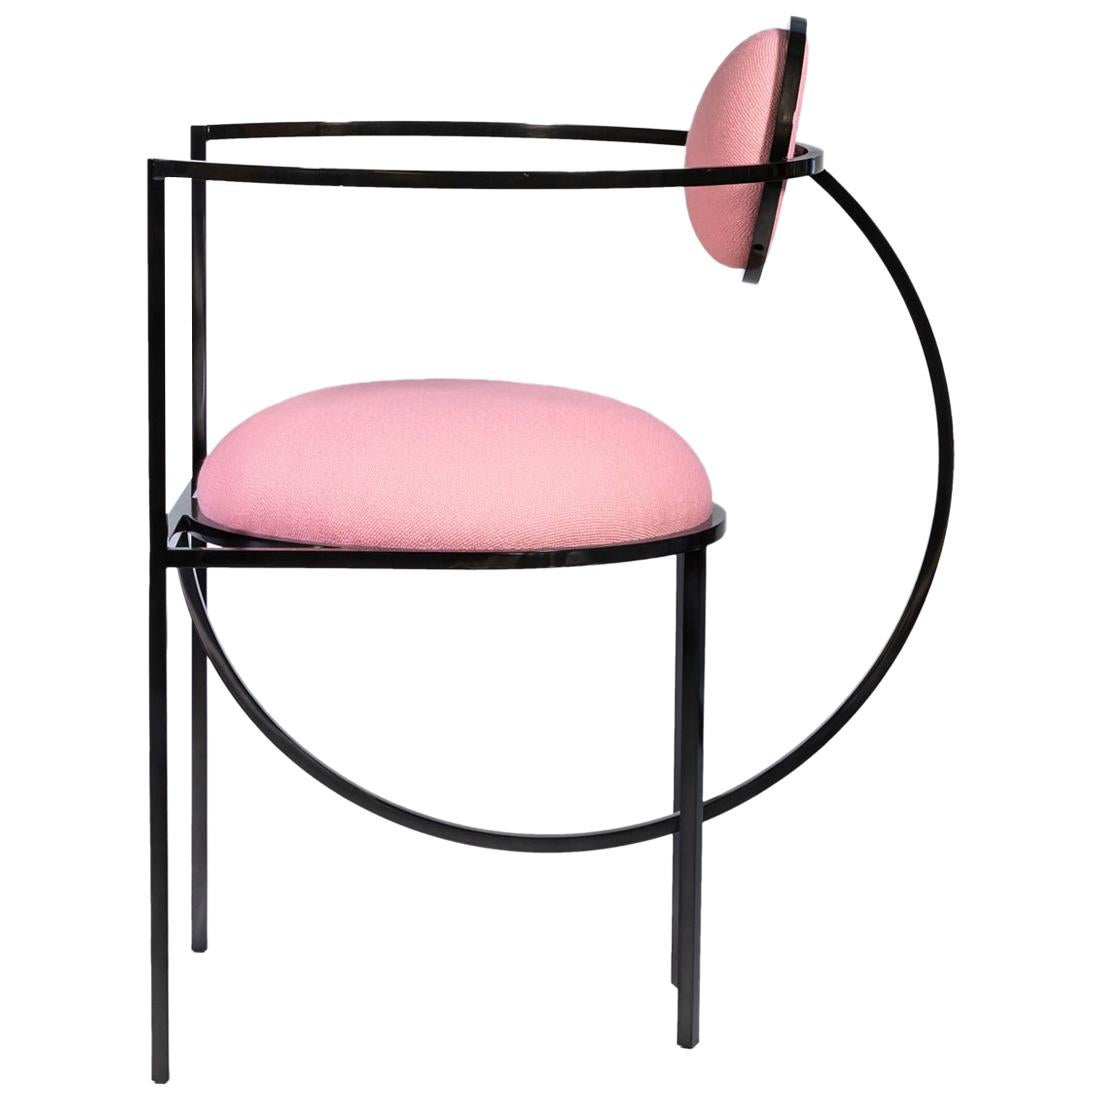 Lunar Chair in Pink Wool Fabric and Black Steel Frame by Lara Bohinc